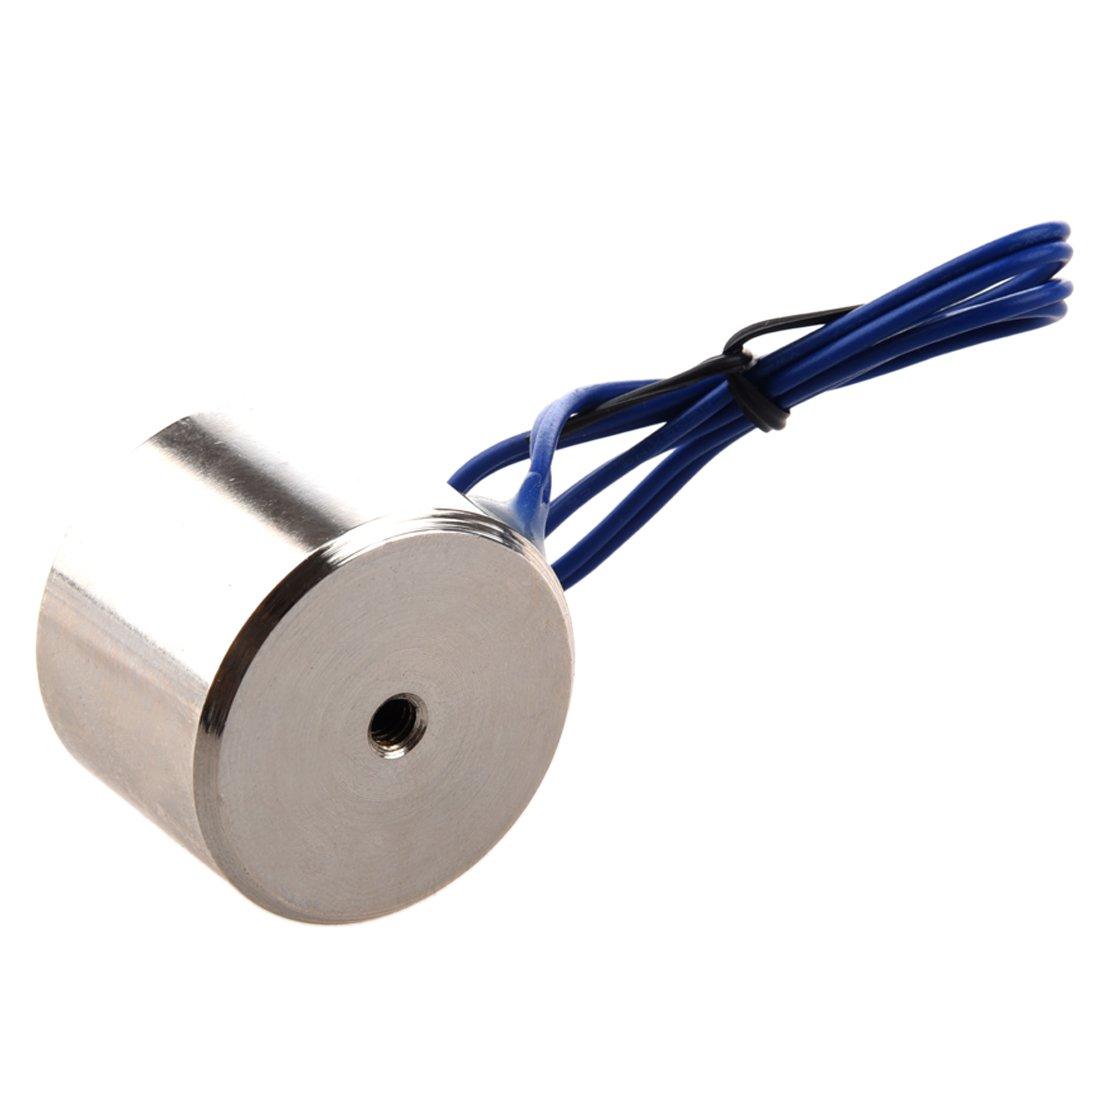 R SODIAL 10Kg 22LBS 12V 5W Iman de elevacion electrico Electroiman Solenoide Electroiman levante propiedad